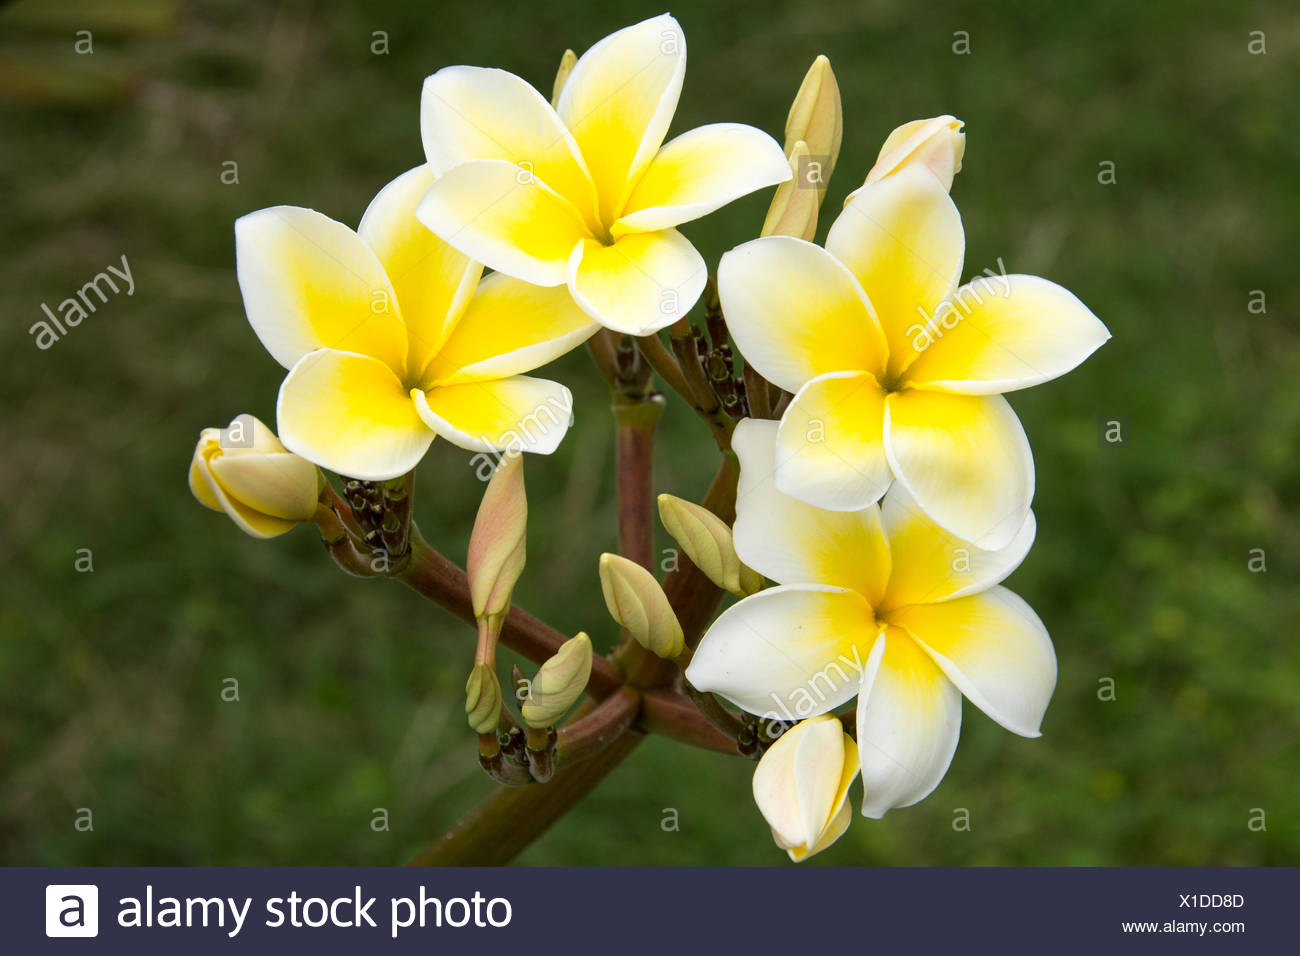 Plumeria flowers maui hawaiian islands usa stock photo 276276349 plumeria flowers maui hawaiian islands usa izmirmasajfo